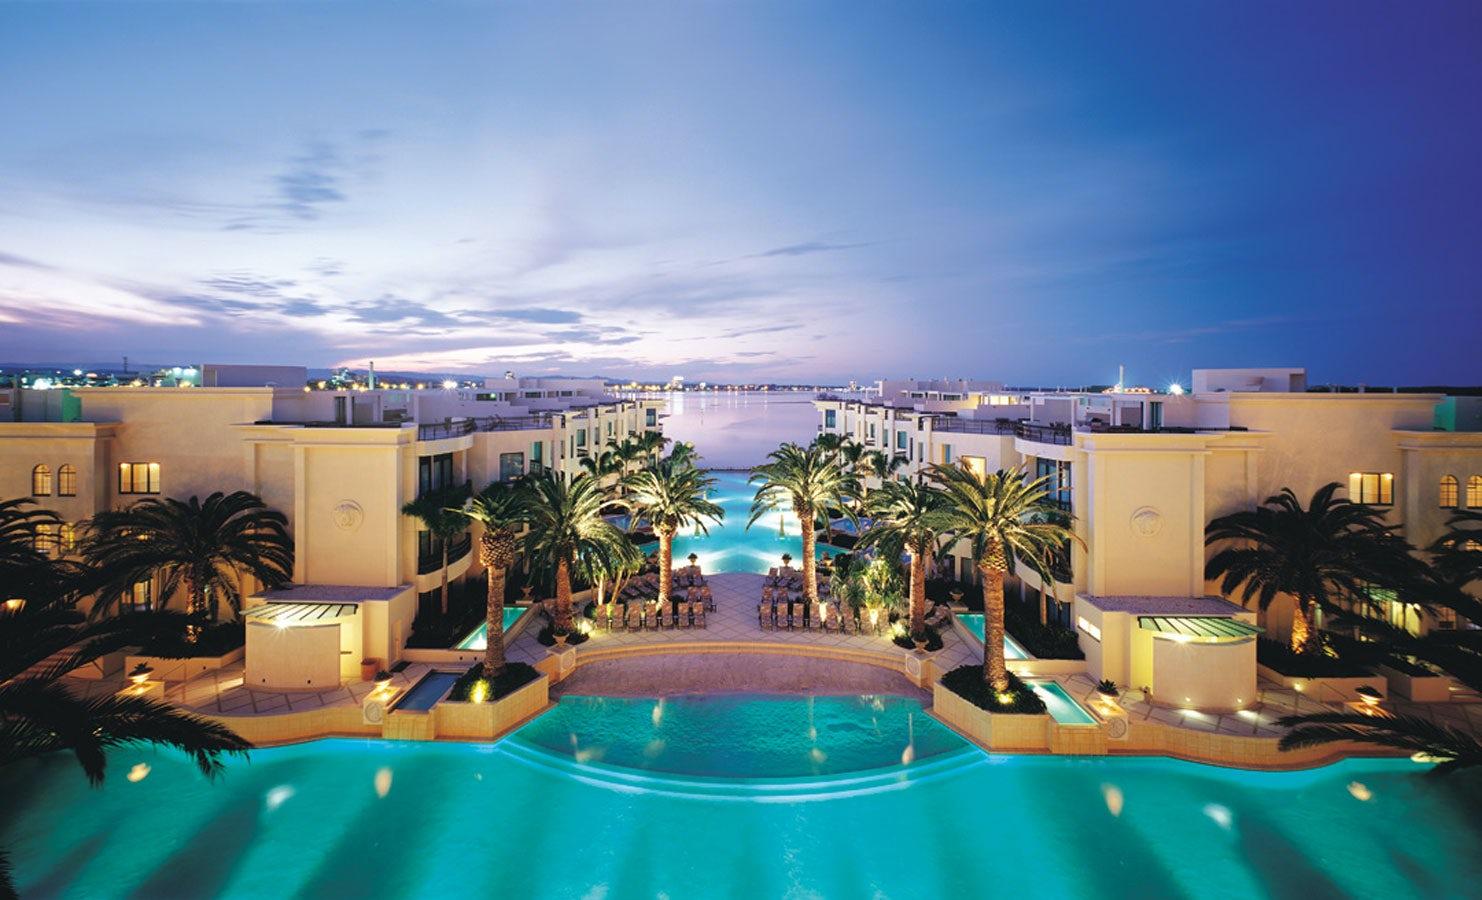 The Palazzo Versace, Gold Coast, Queensland, Australia | Source: DBI Design